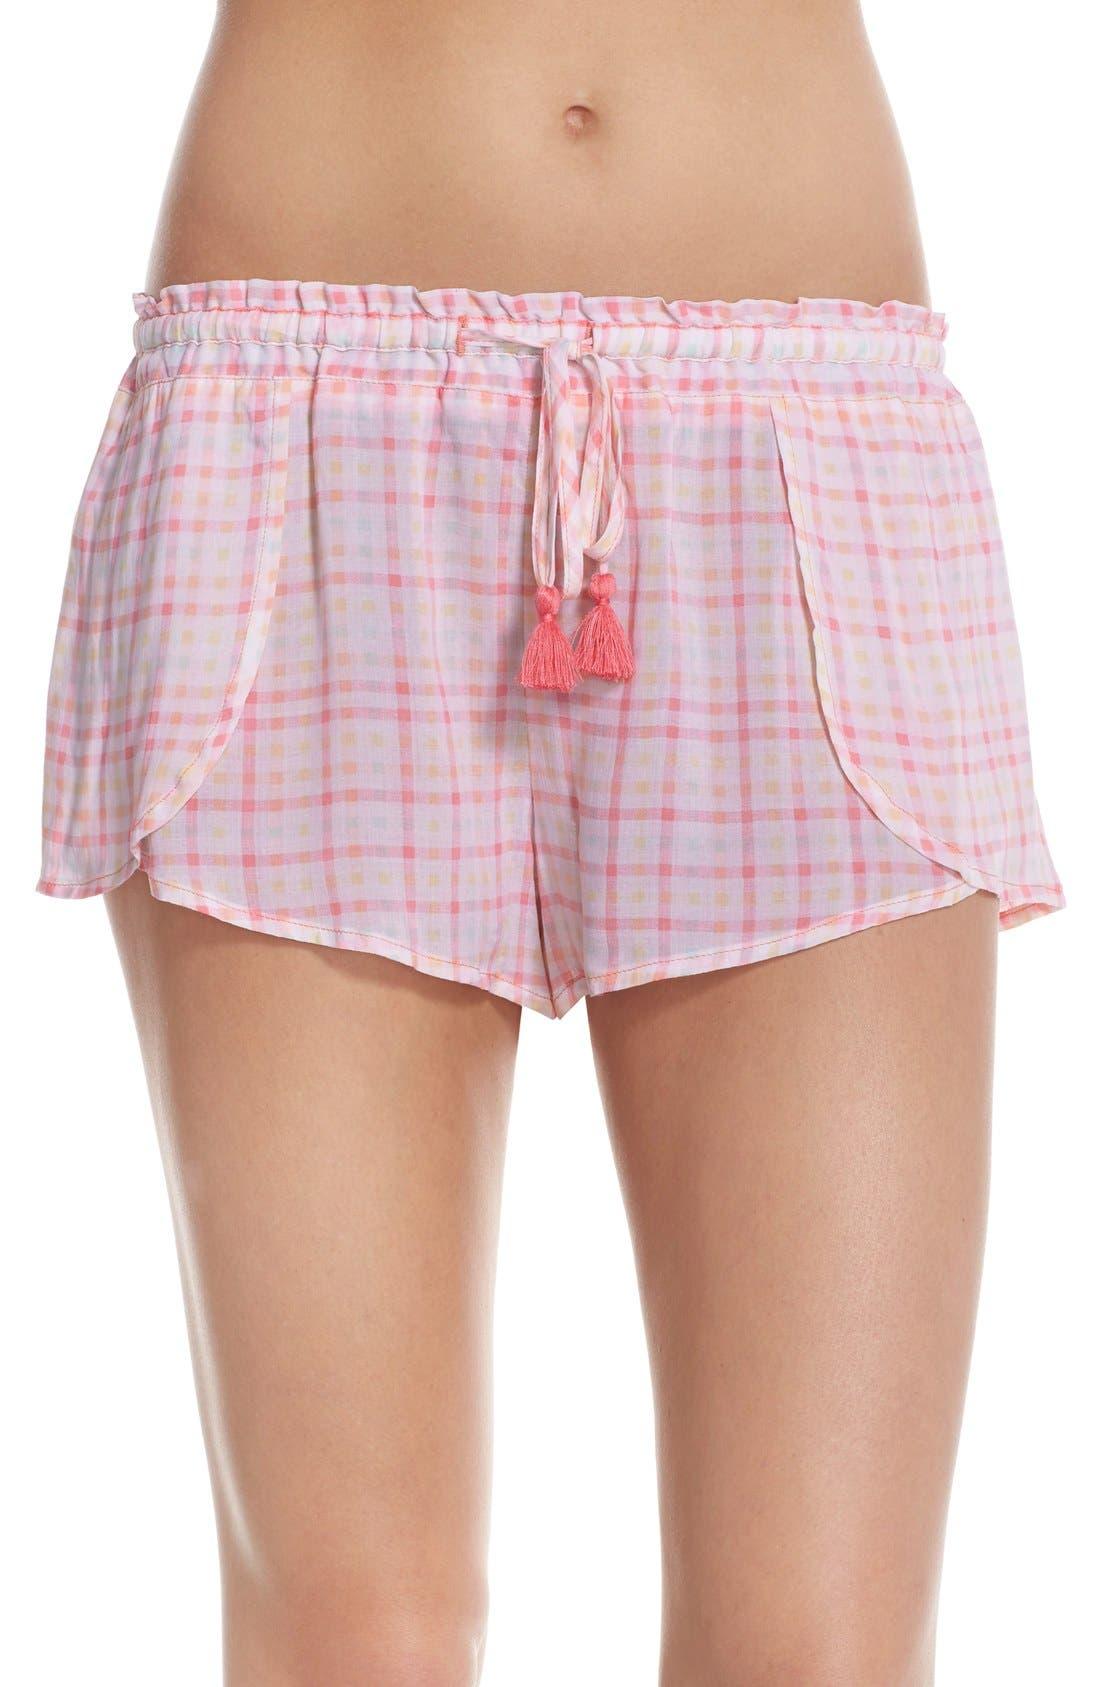 Main Image - Make + Model 'Smock' Lounge Shorts